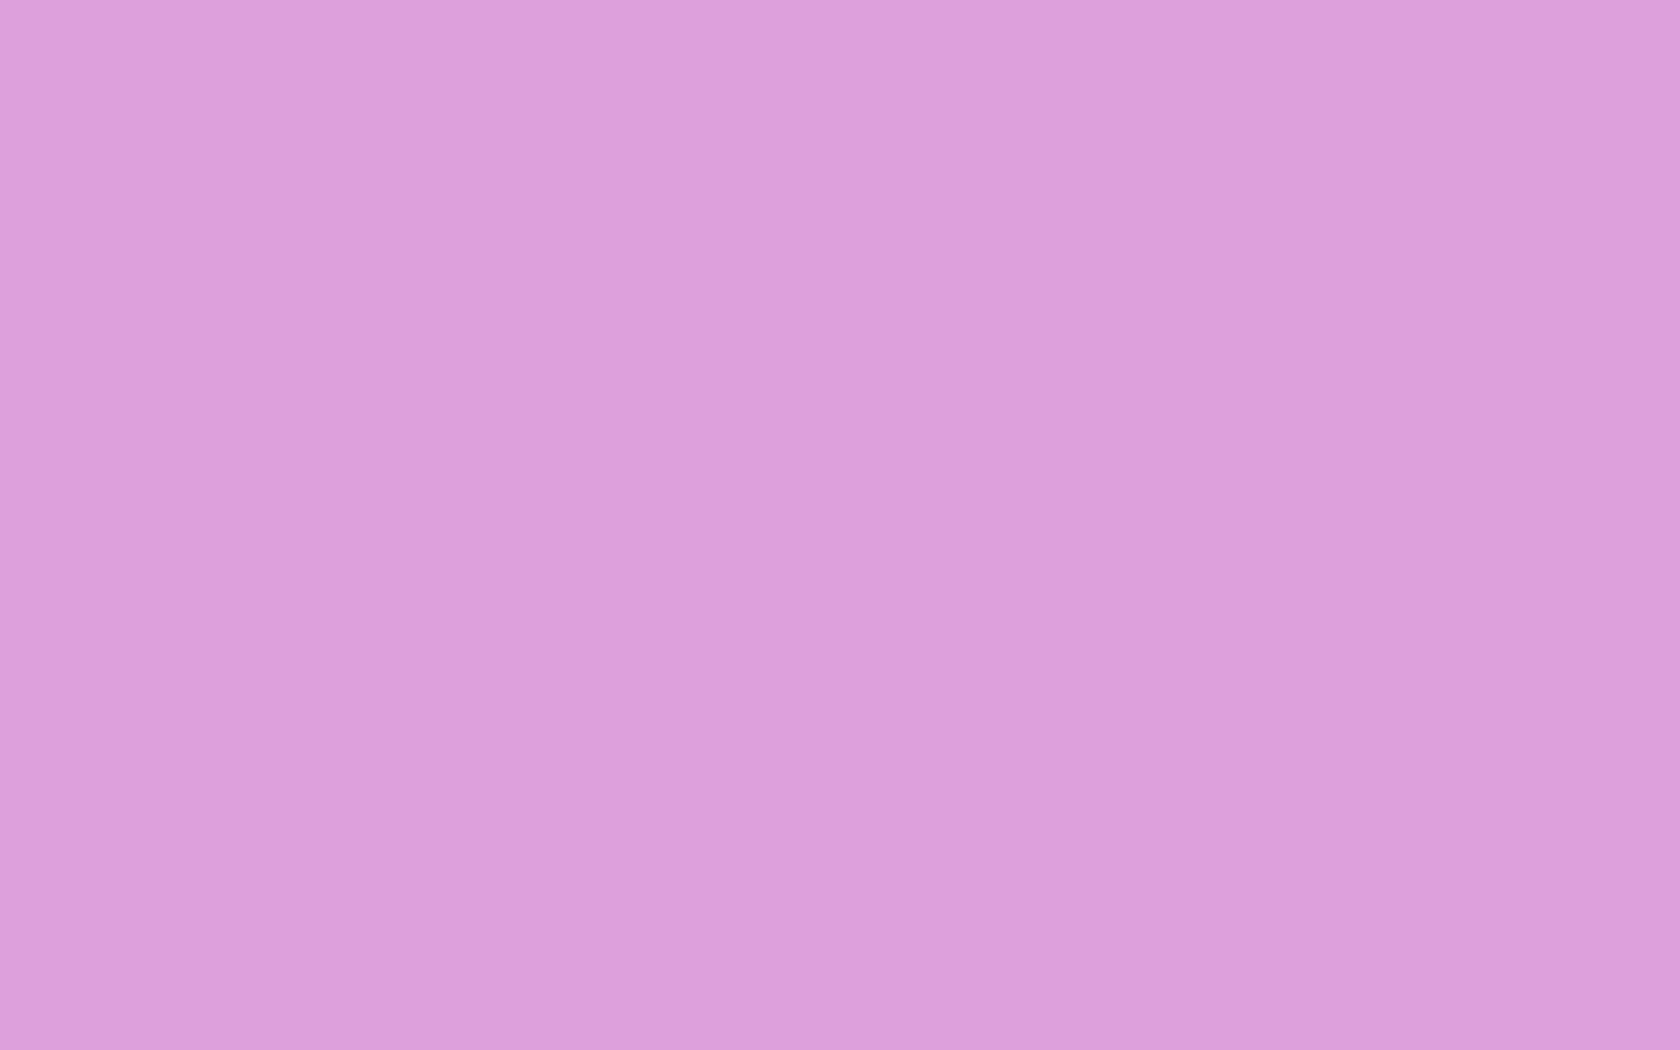 1680x1050 Medium Lavender Magenta Solid Color Background